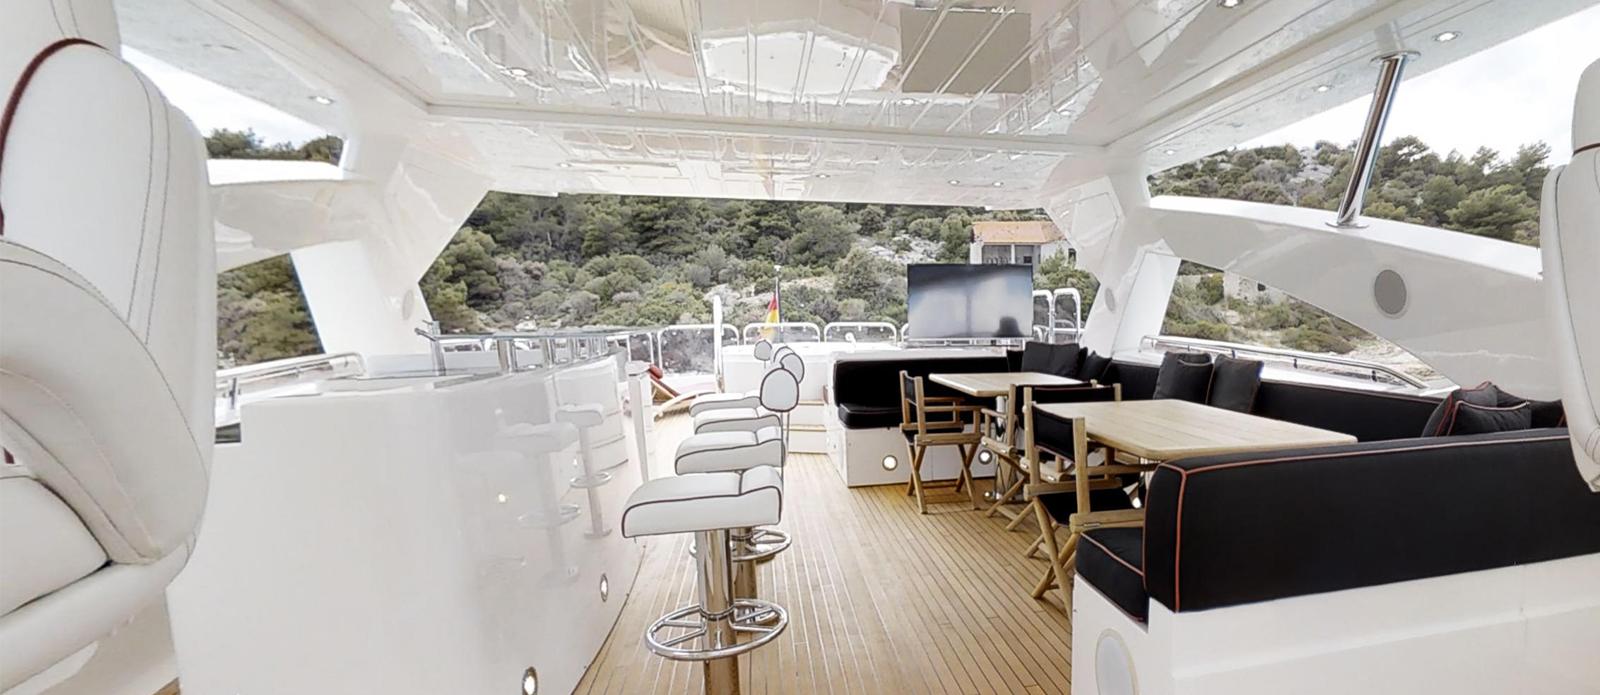 Sunseeker 34m Yacht Flybridge